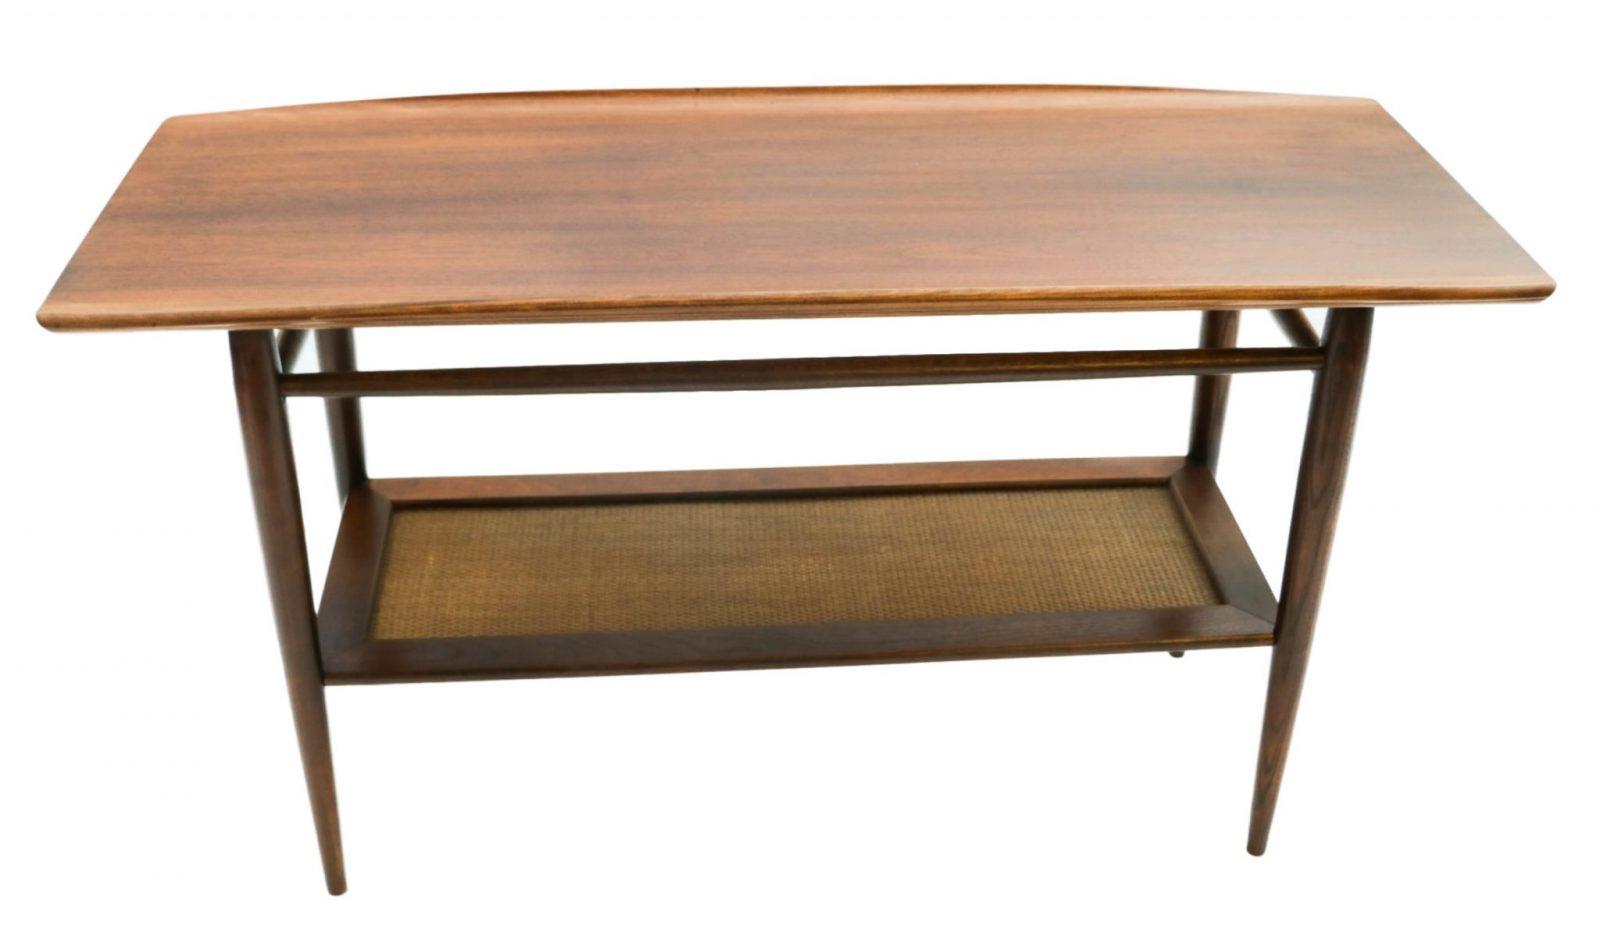 Beautiful Mid Century Modern Walnut Bassett Two Tier Console sofa